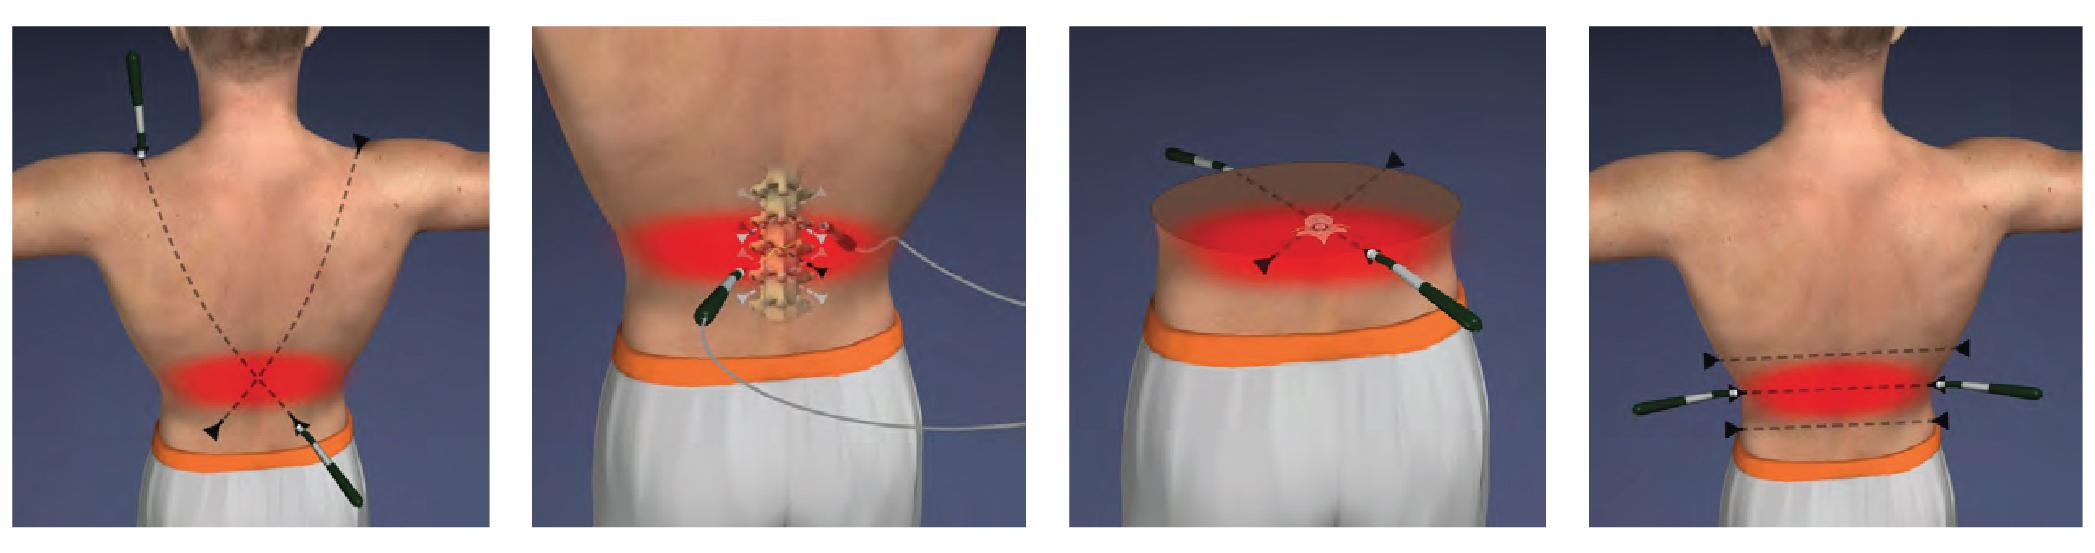 back-pain-171